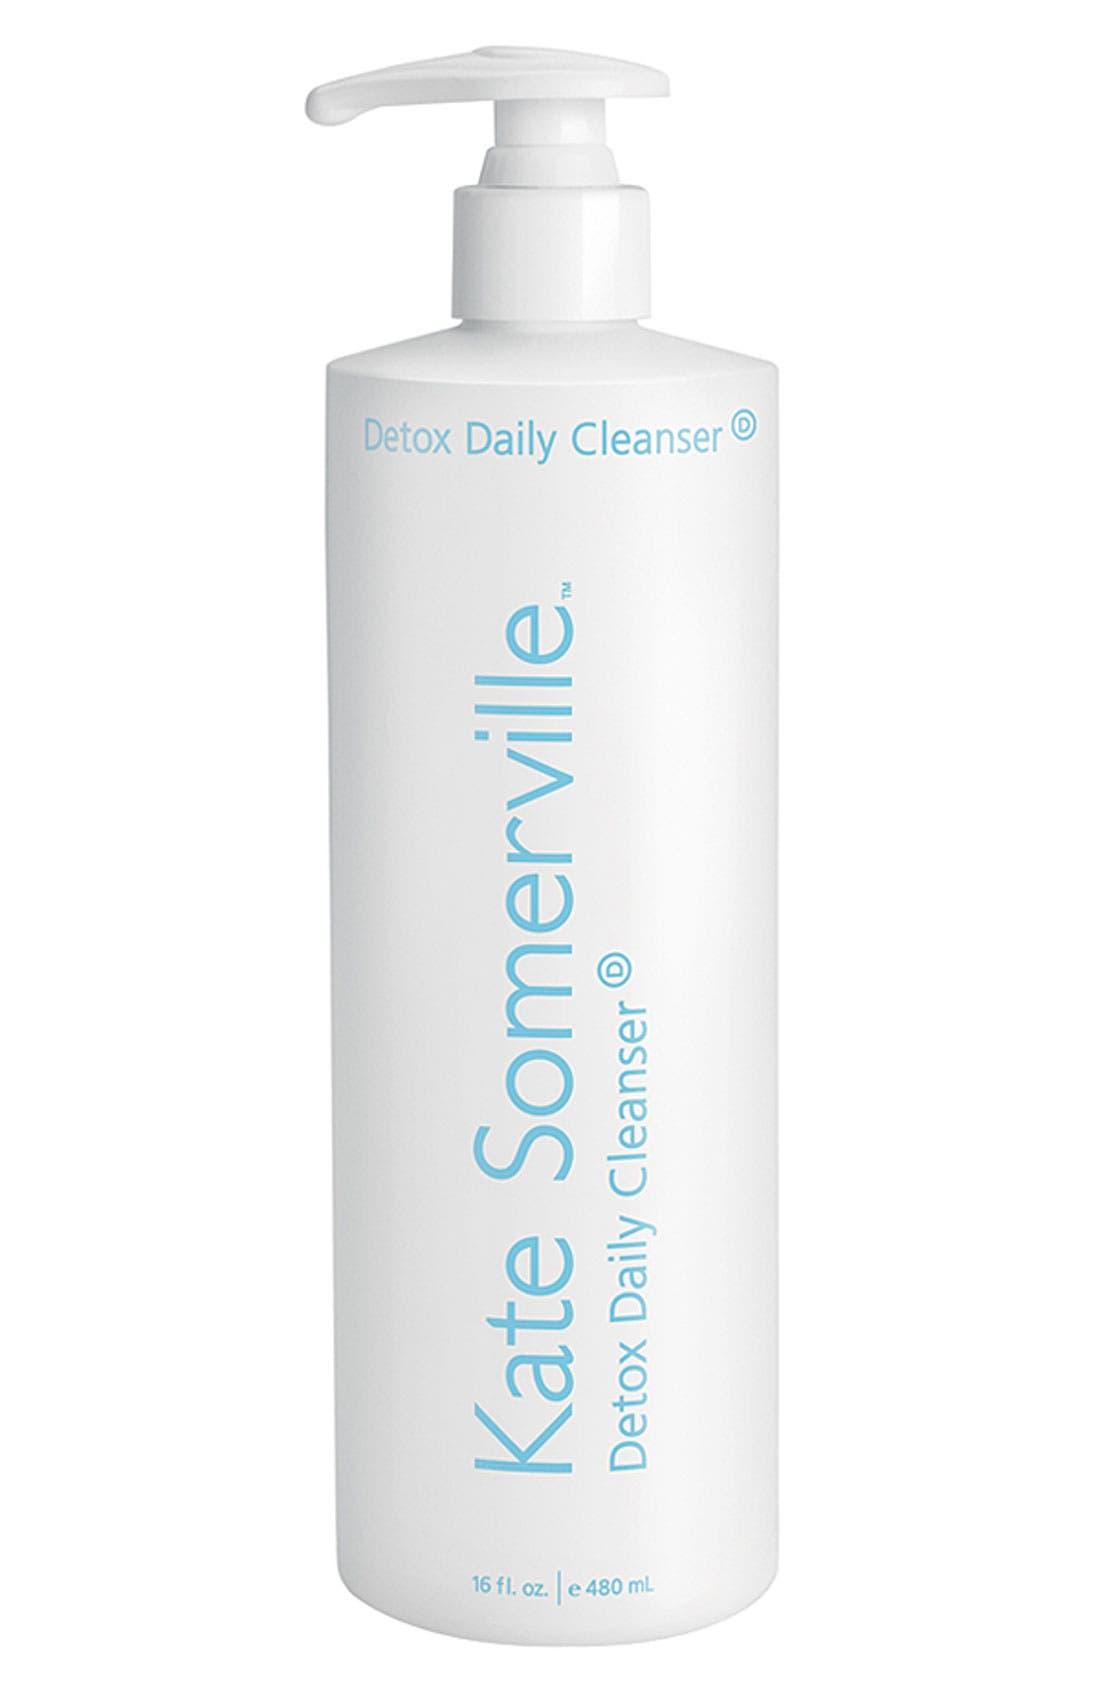 Kate Somerville® 'Detox' Daily Cleanser ($128 Value)